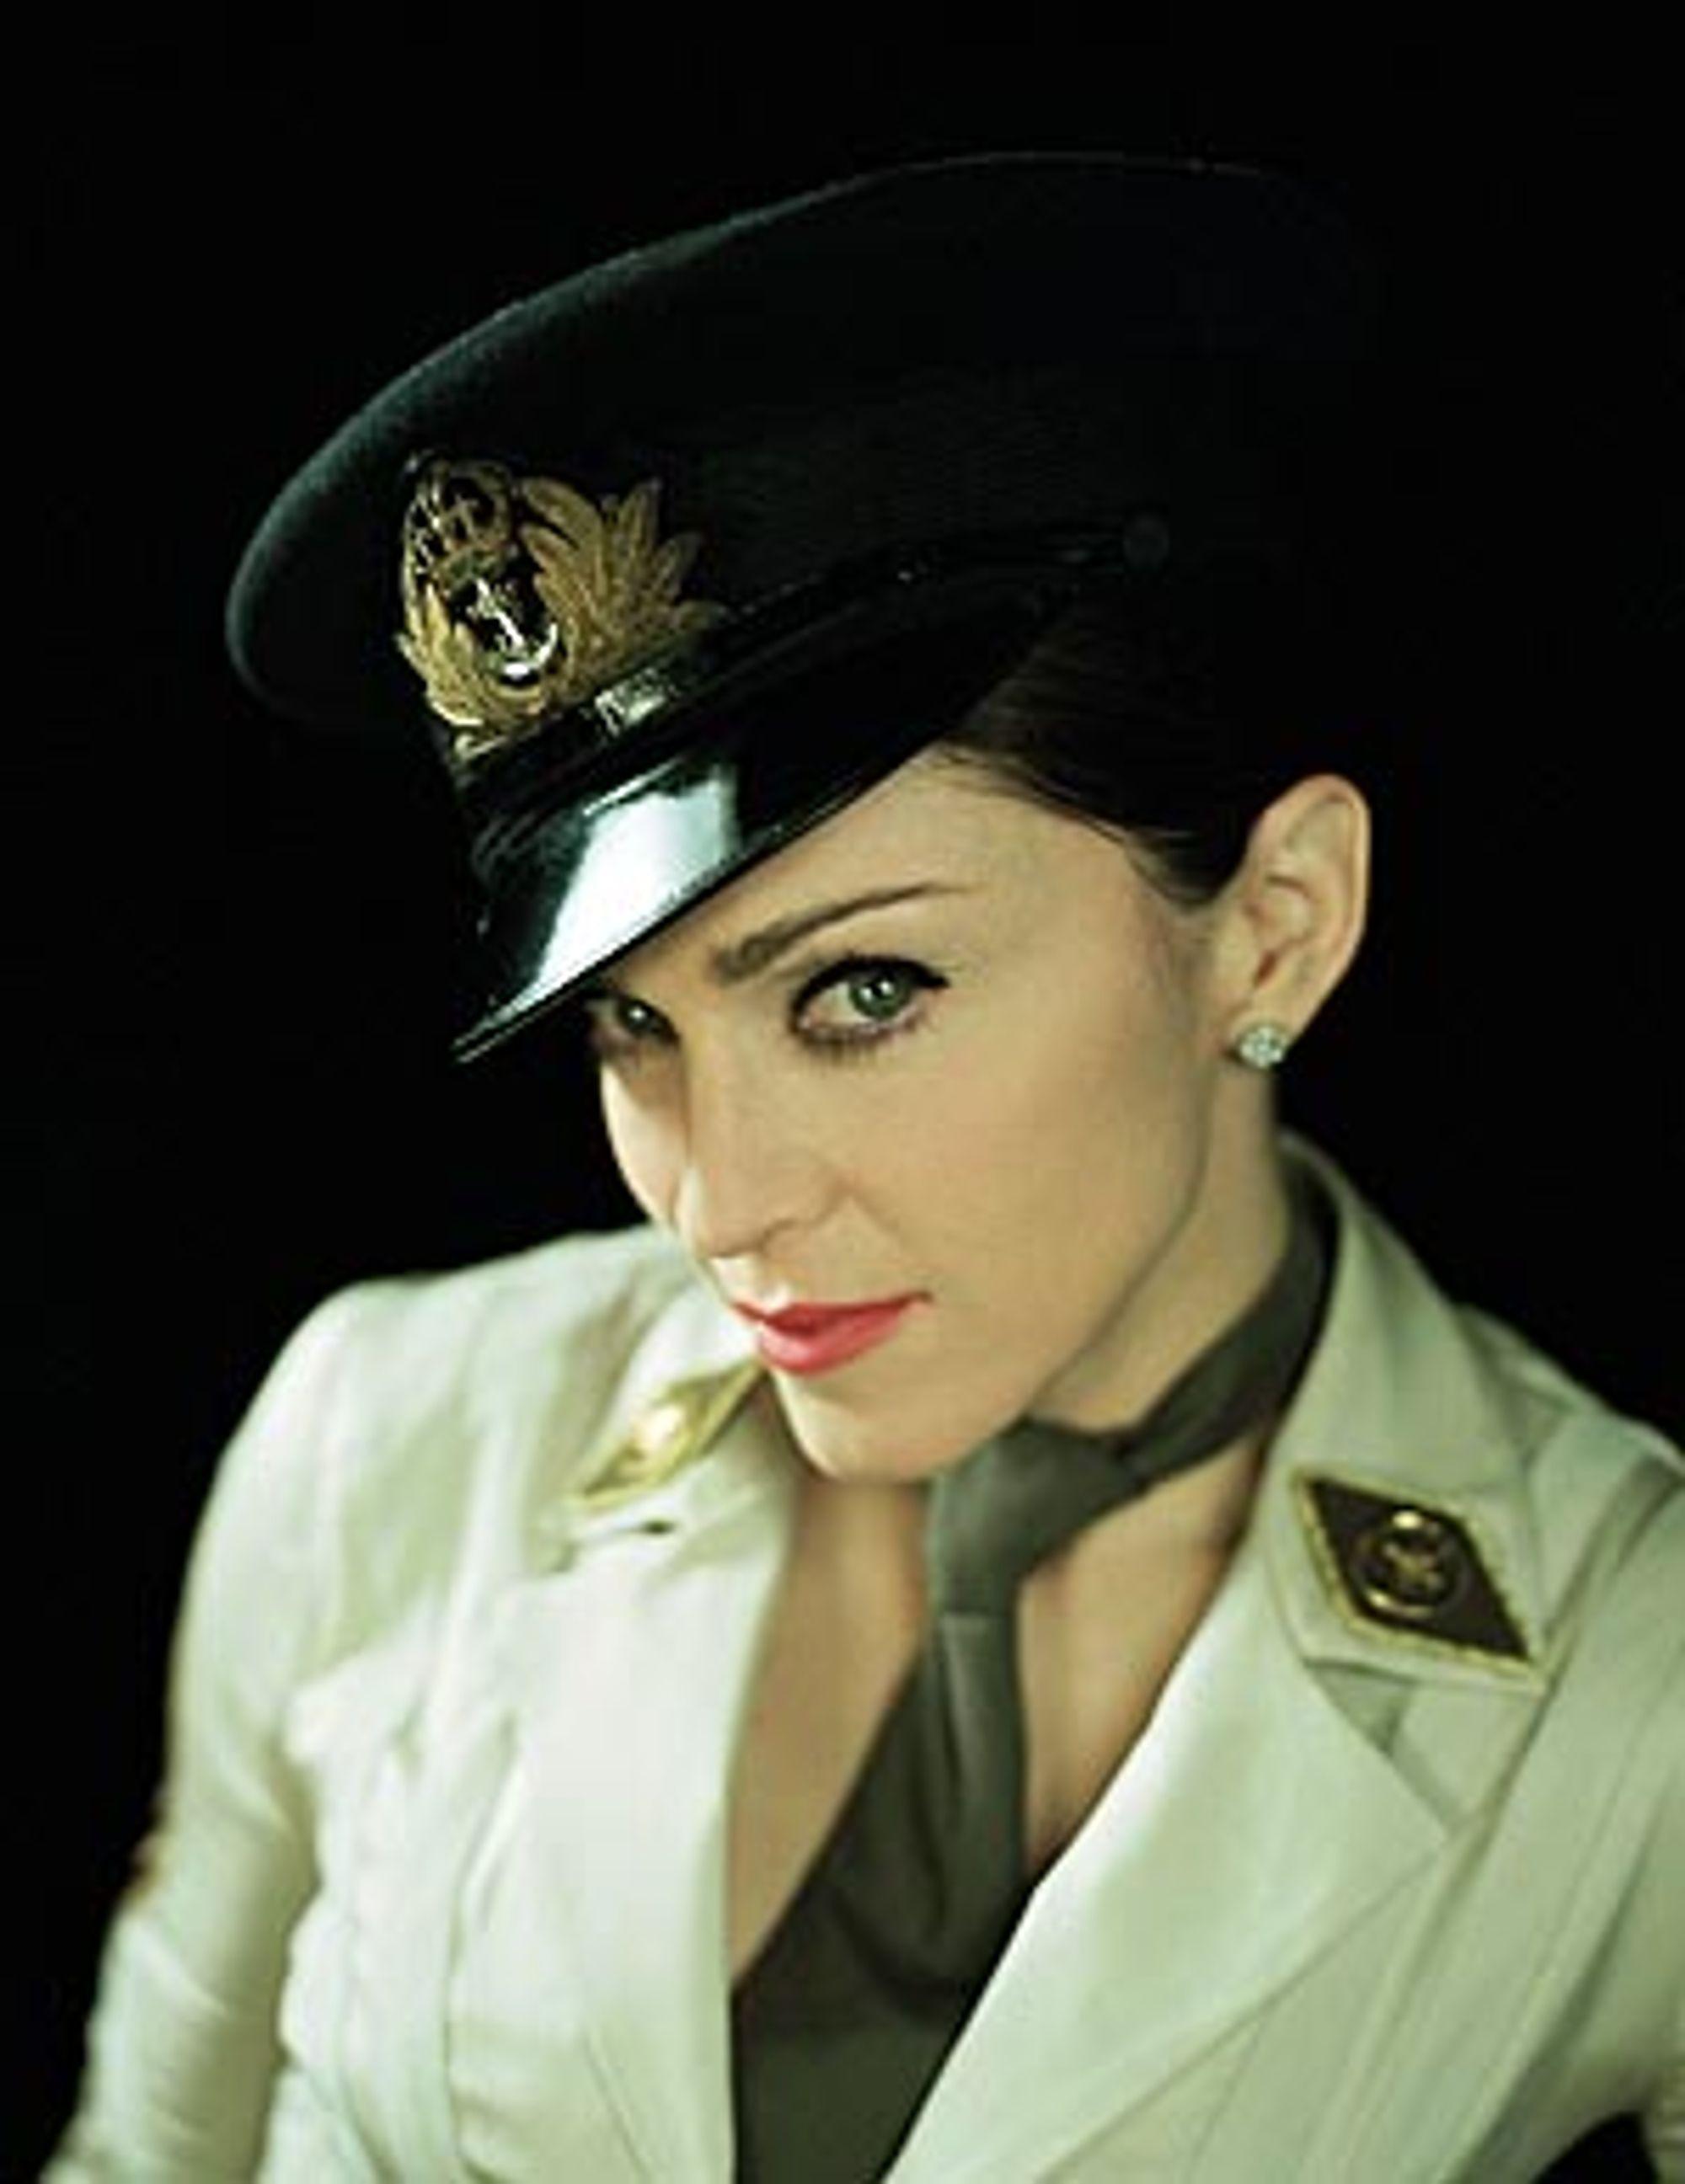 Tyve sekunder av Madonnas nye låt